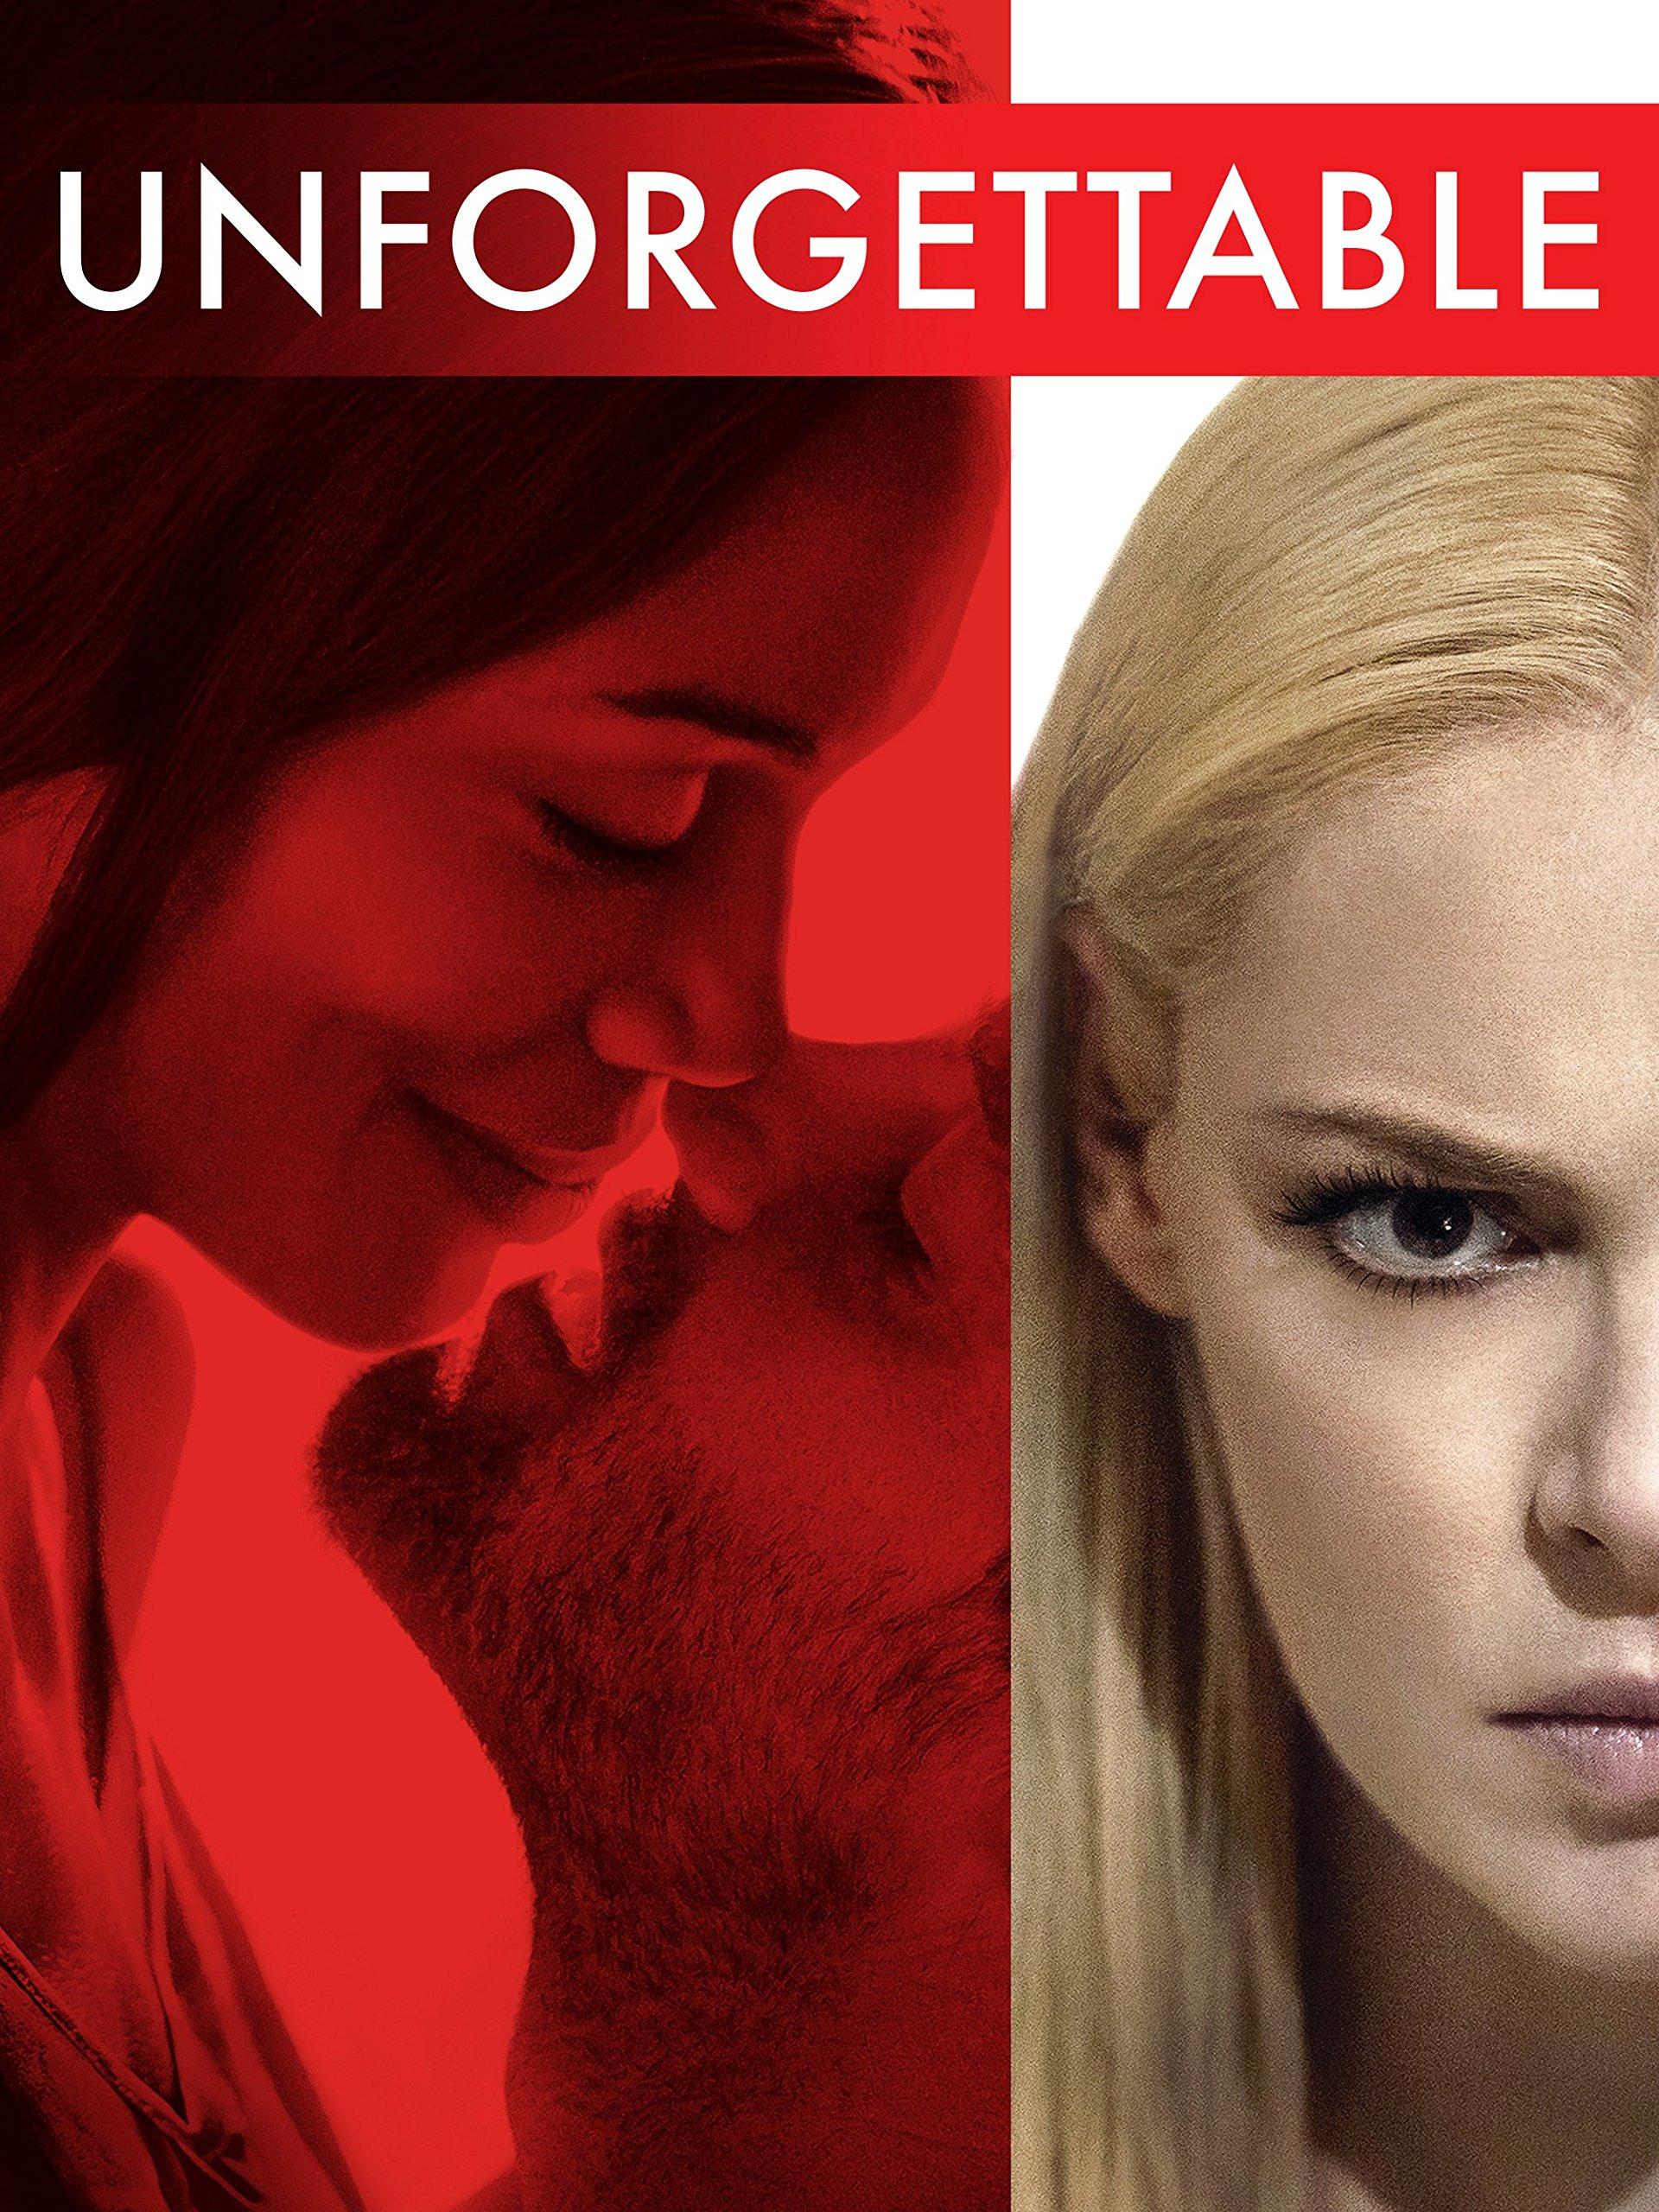 the unforgettable 2009 full movie online